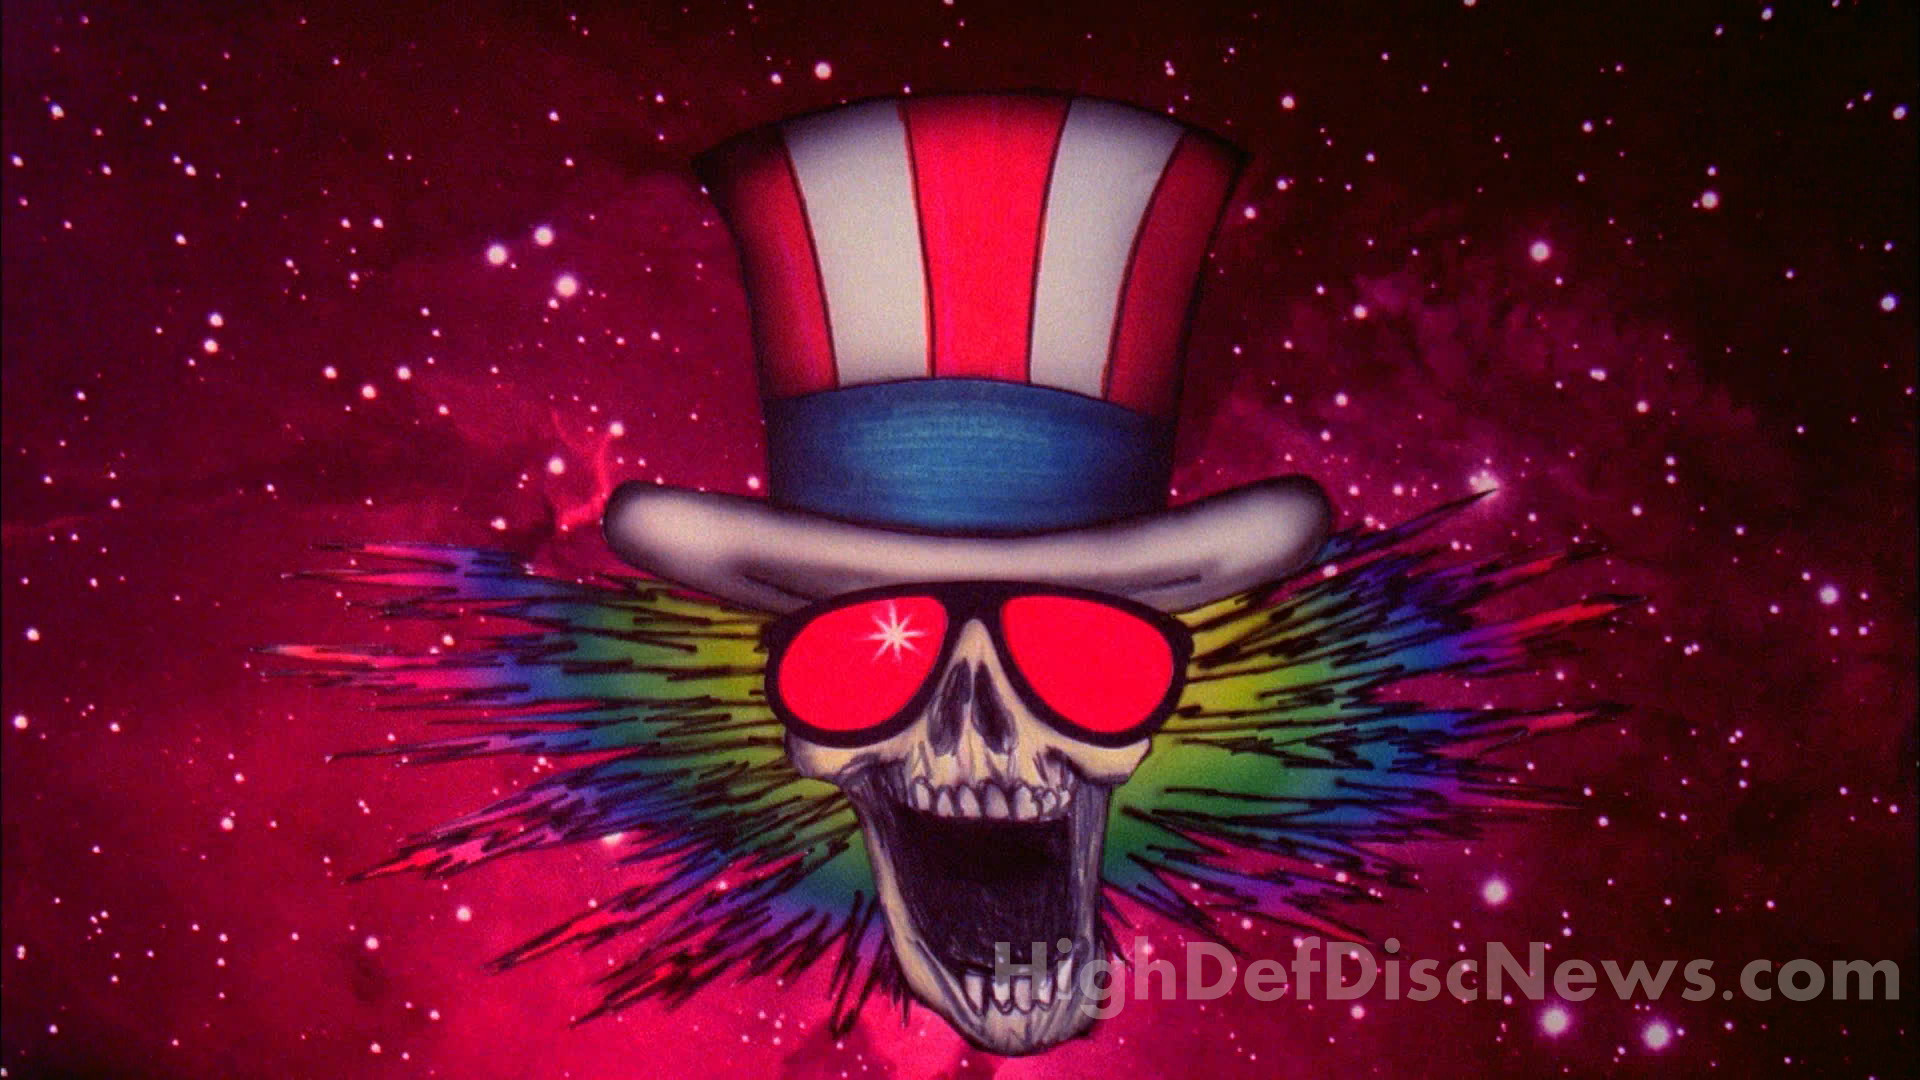 Grateful Dead Desktop Wallpaper: Grateful Dead 50 Wallpaper (54+ Images